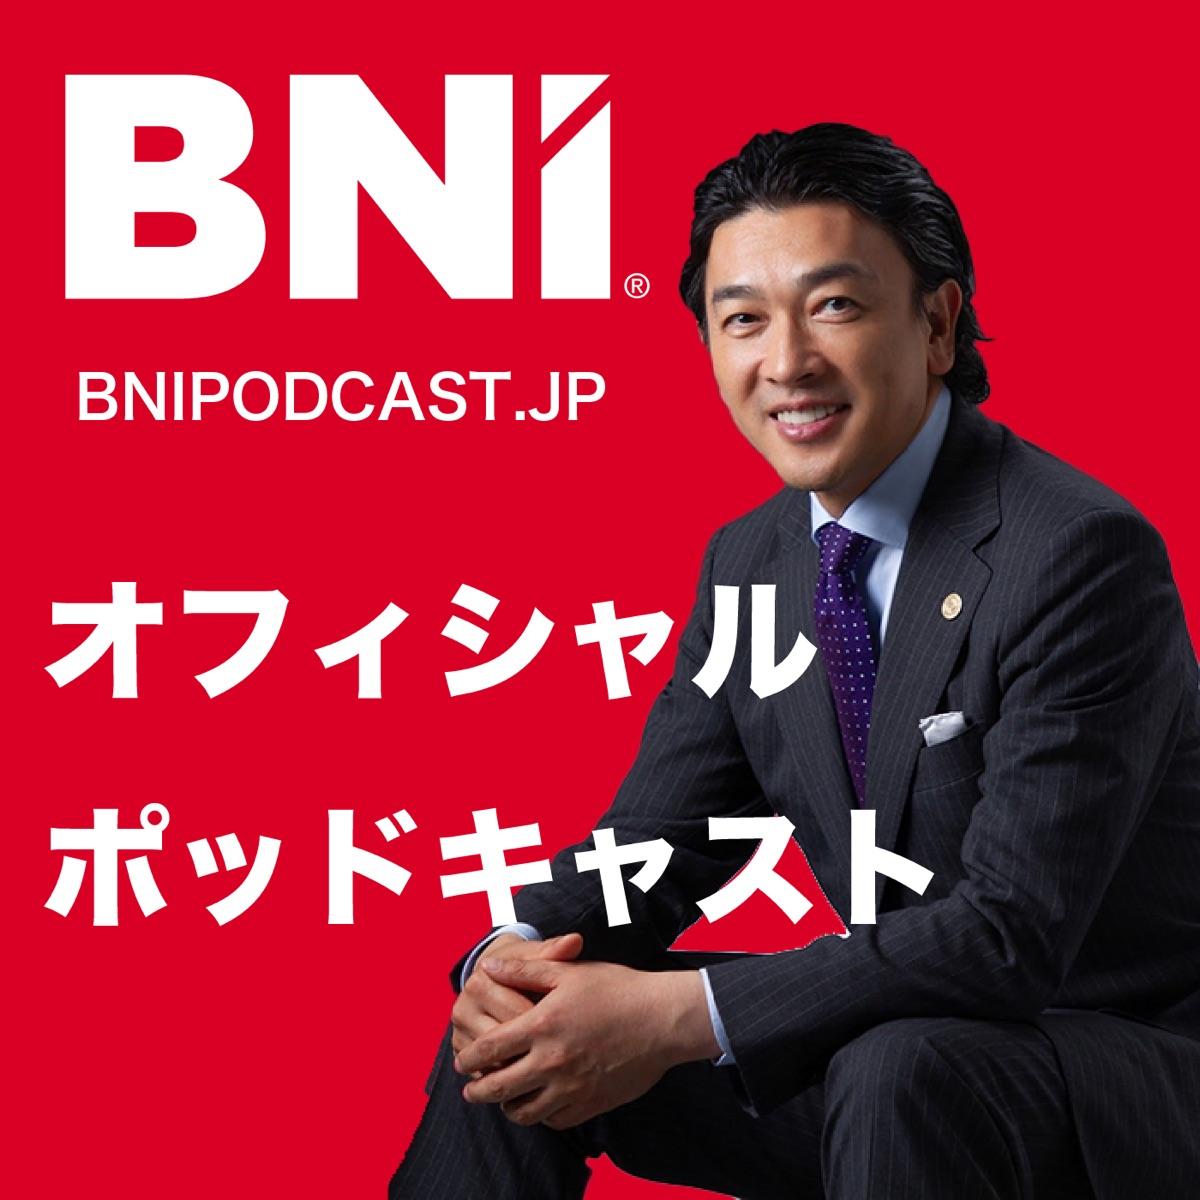 Official BNI Podcast